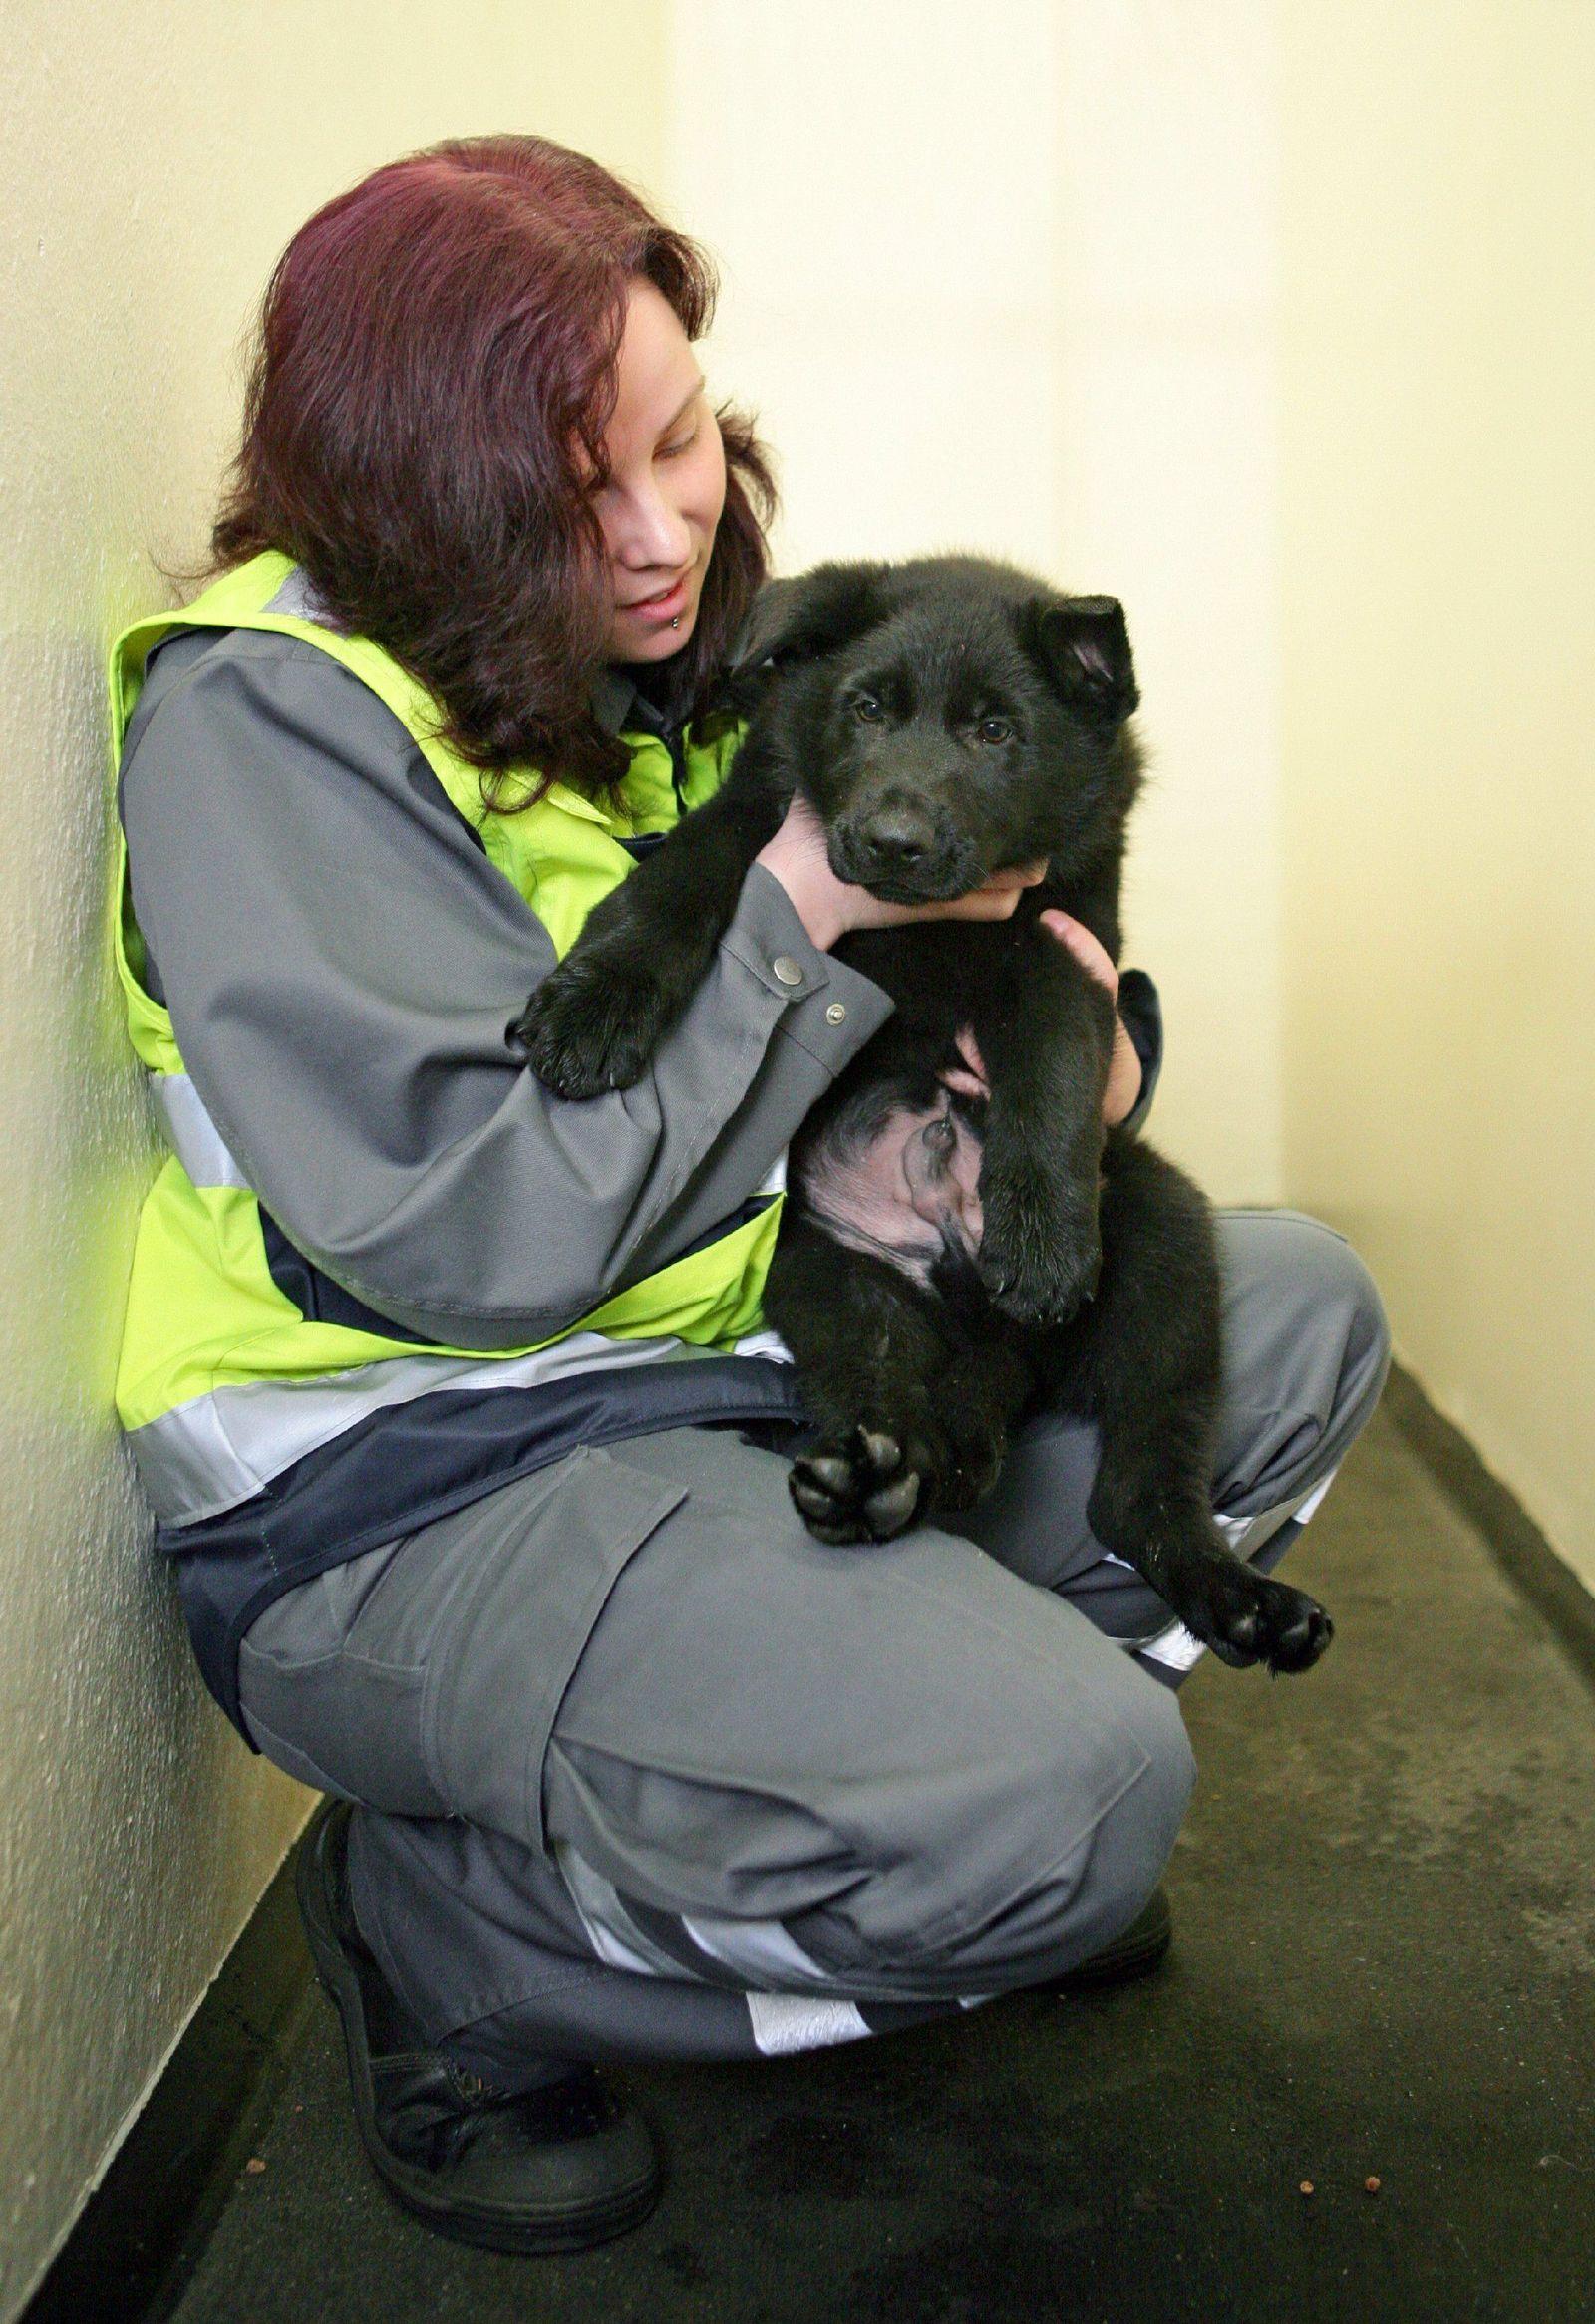 Tiefpflegerin / Tierstation